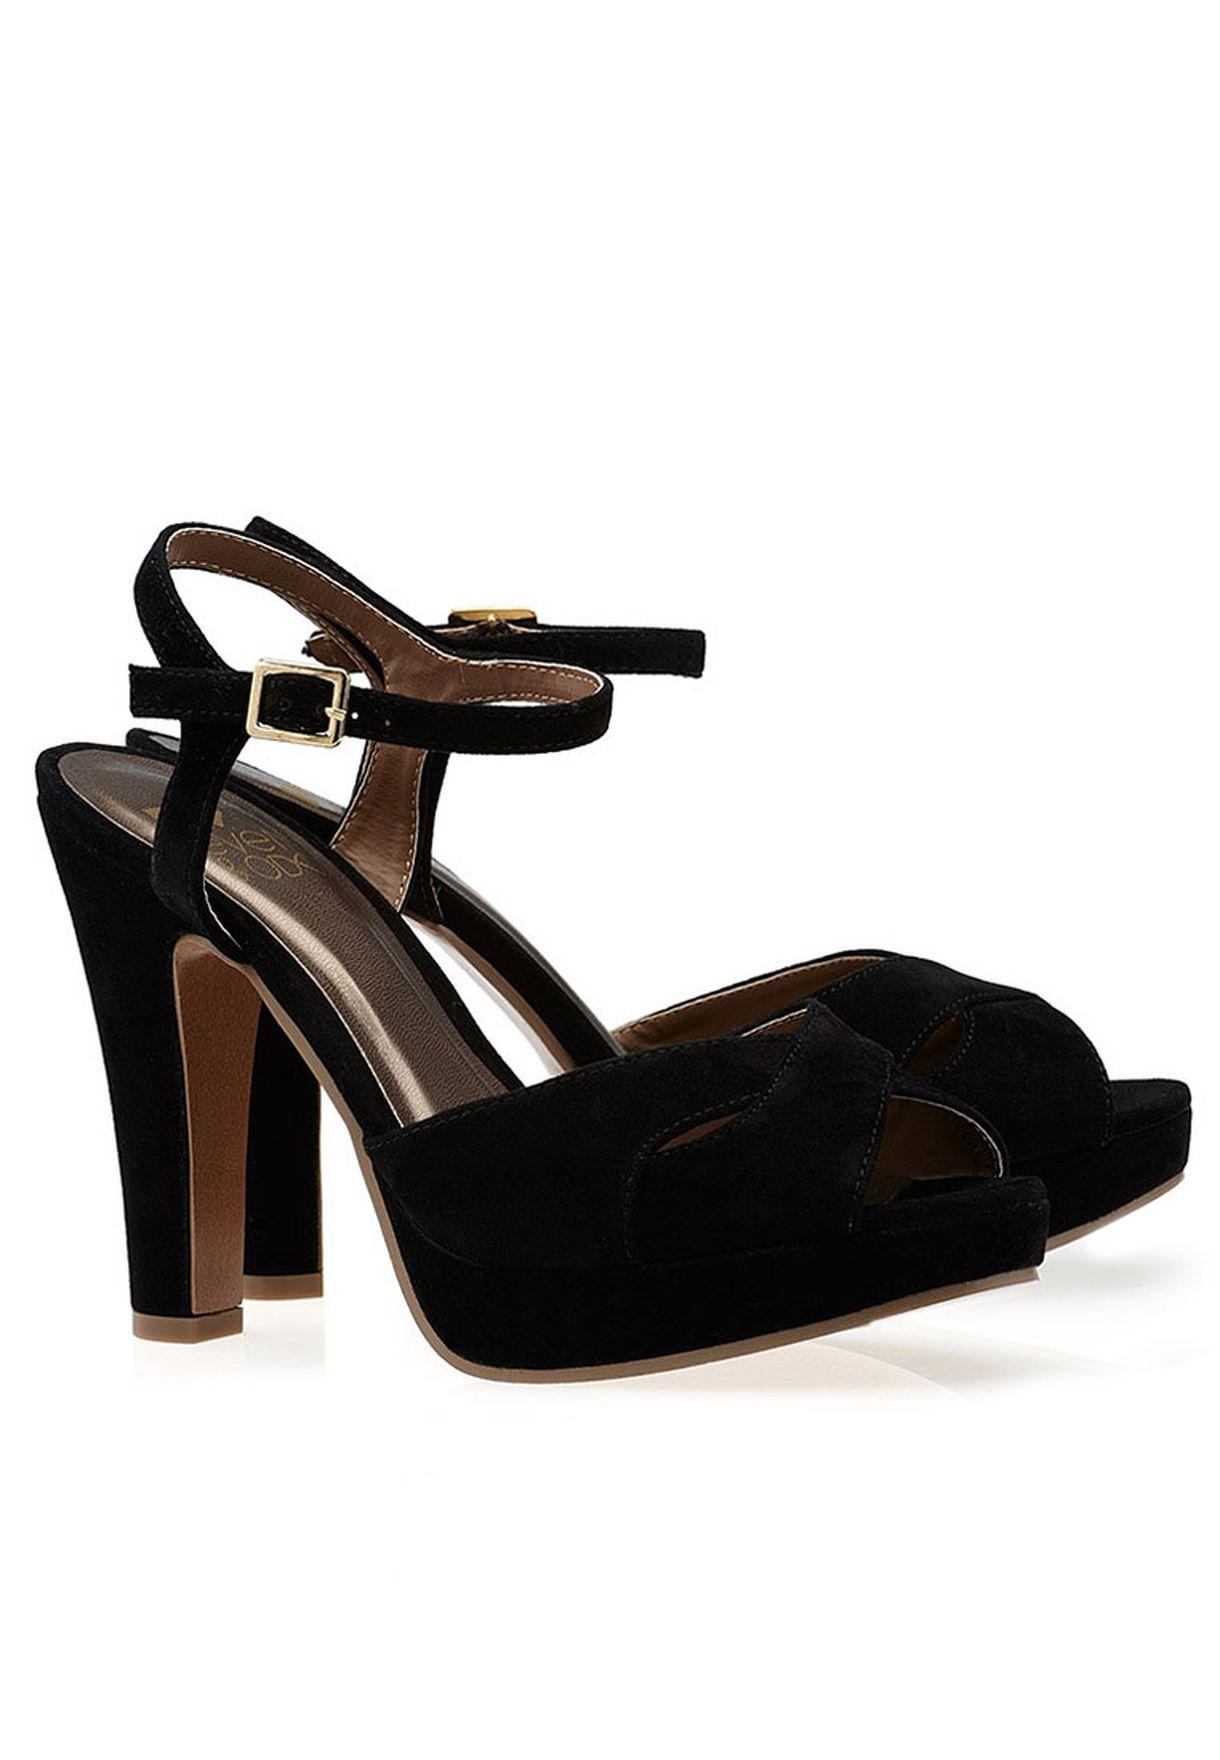 cc9e8874731 Shop Even odd black Classic High Heel Sandal for Women in UAE ...